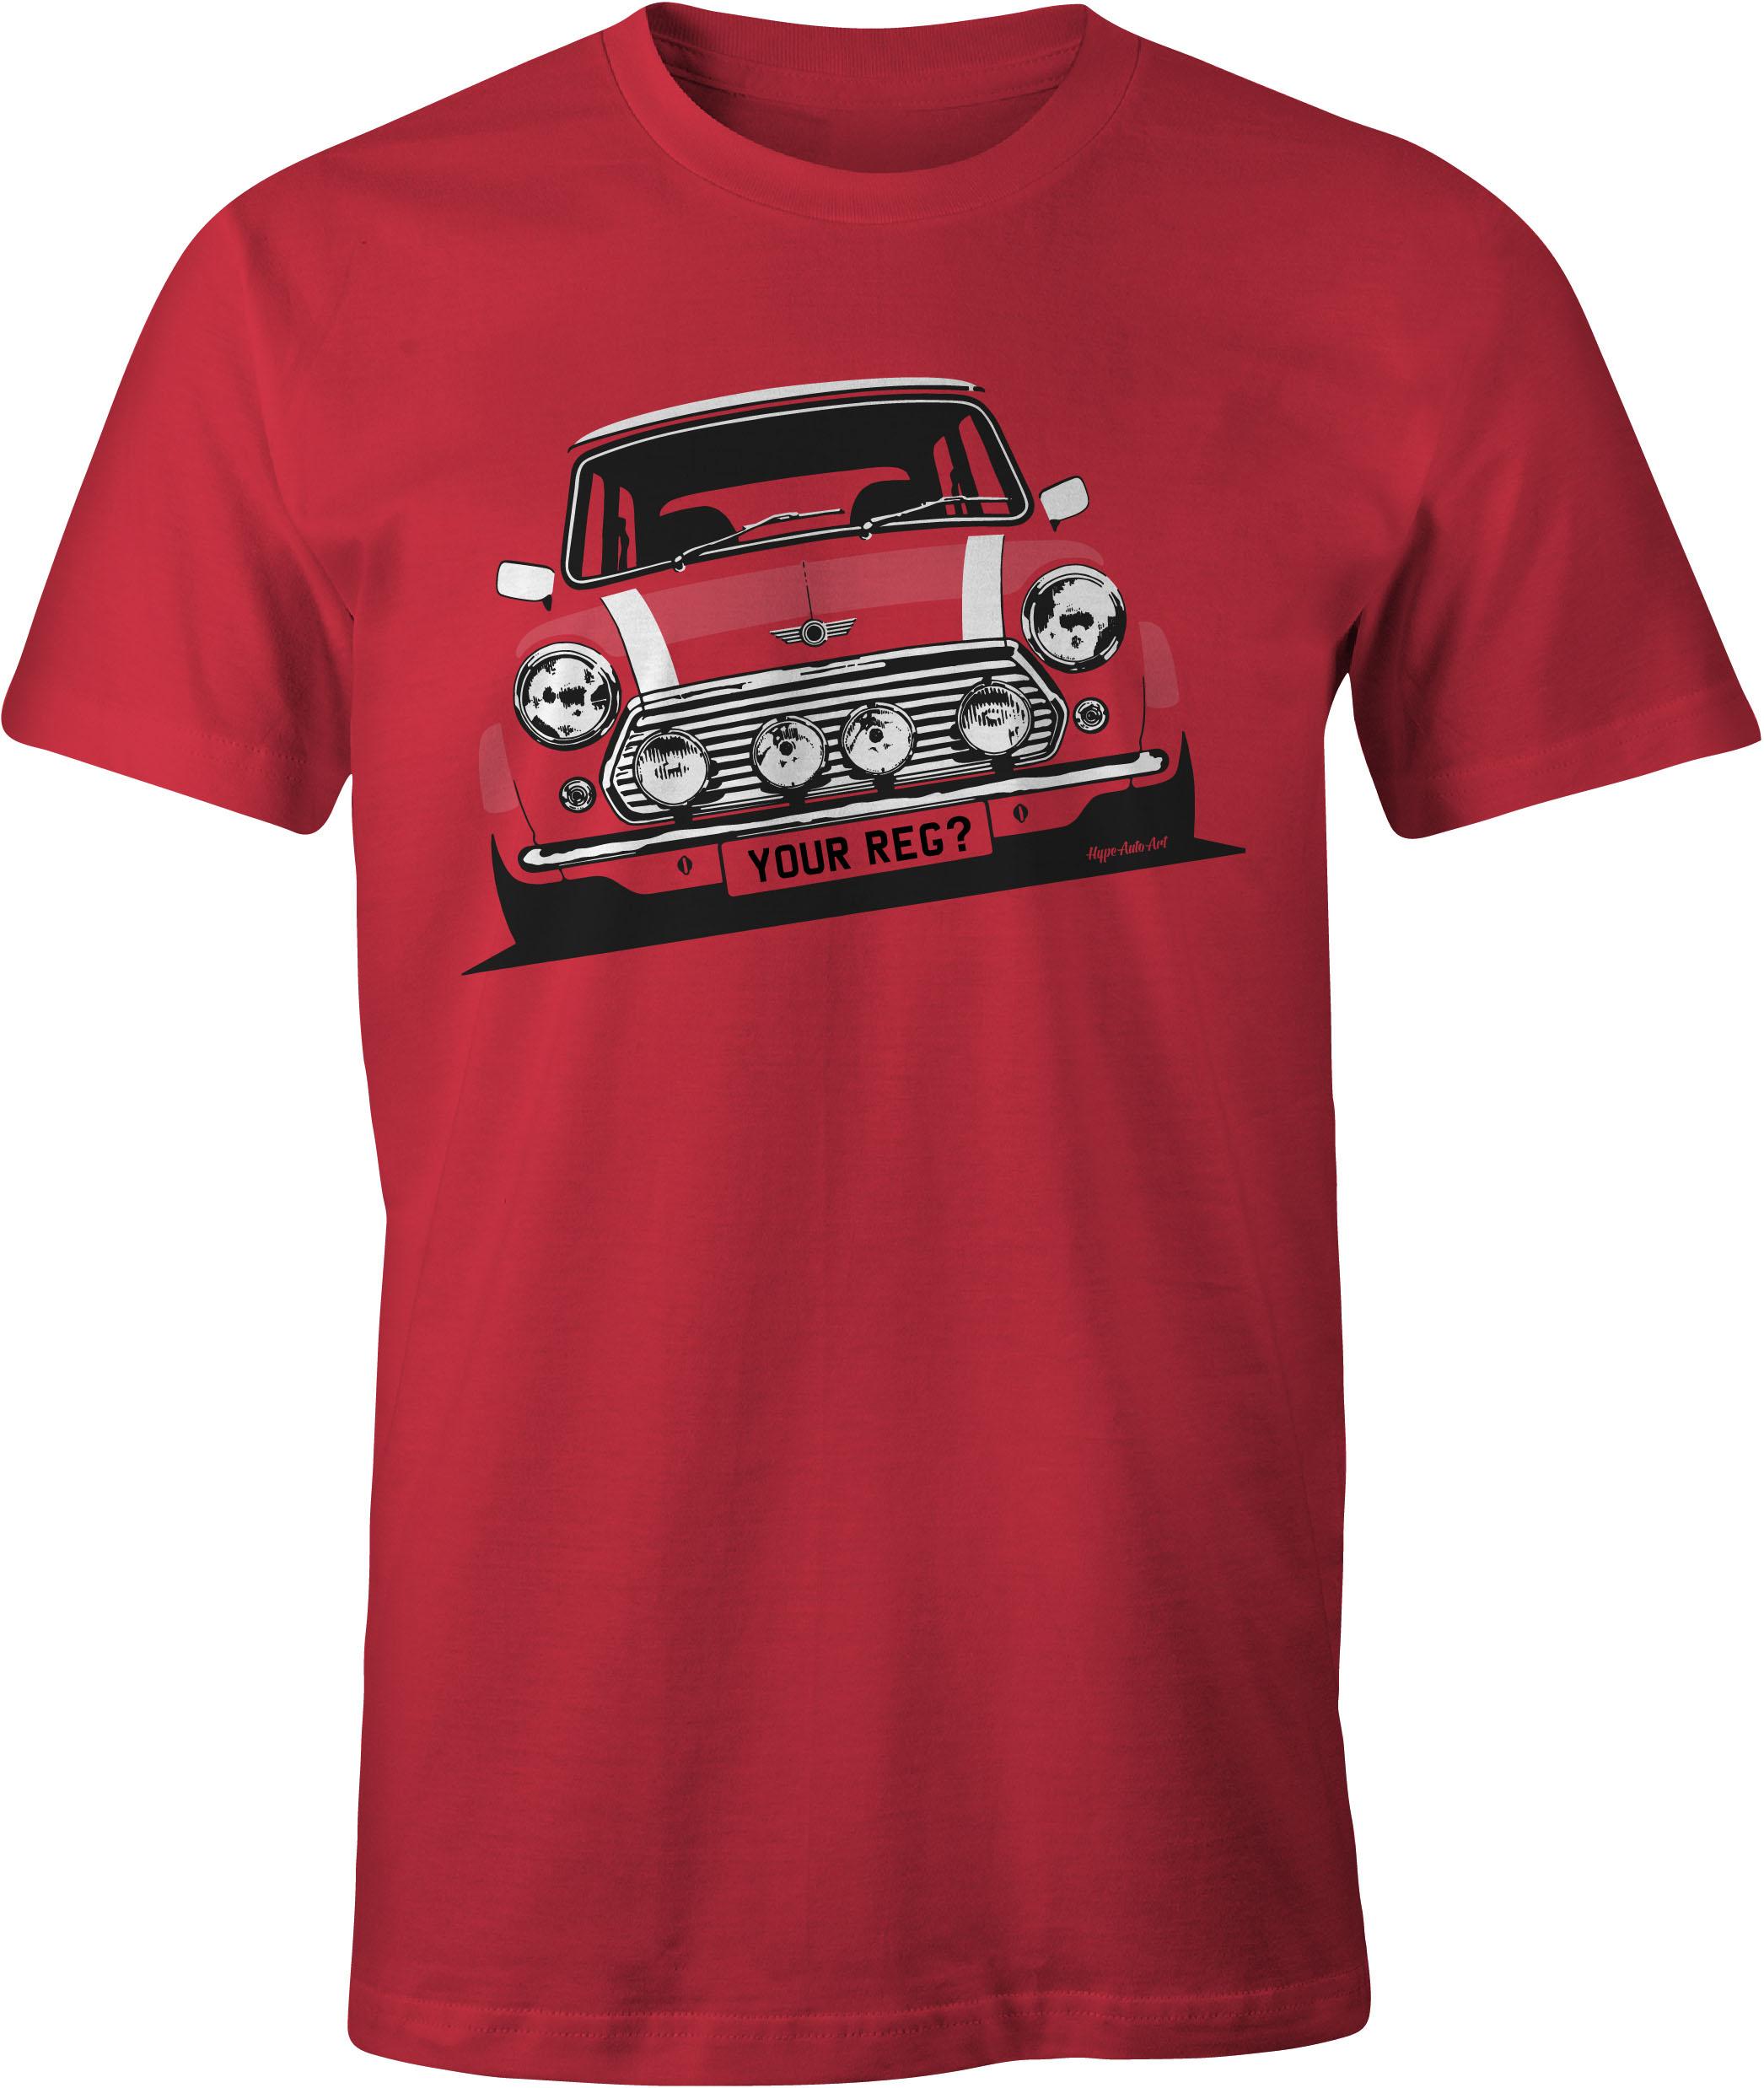 Mini Cooper T Shirt Iconic Ironic